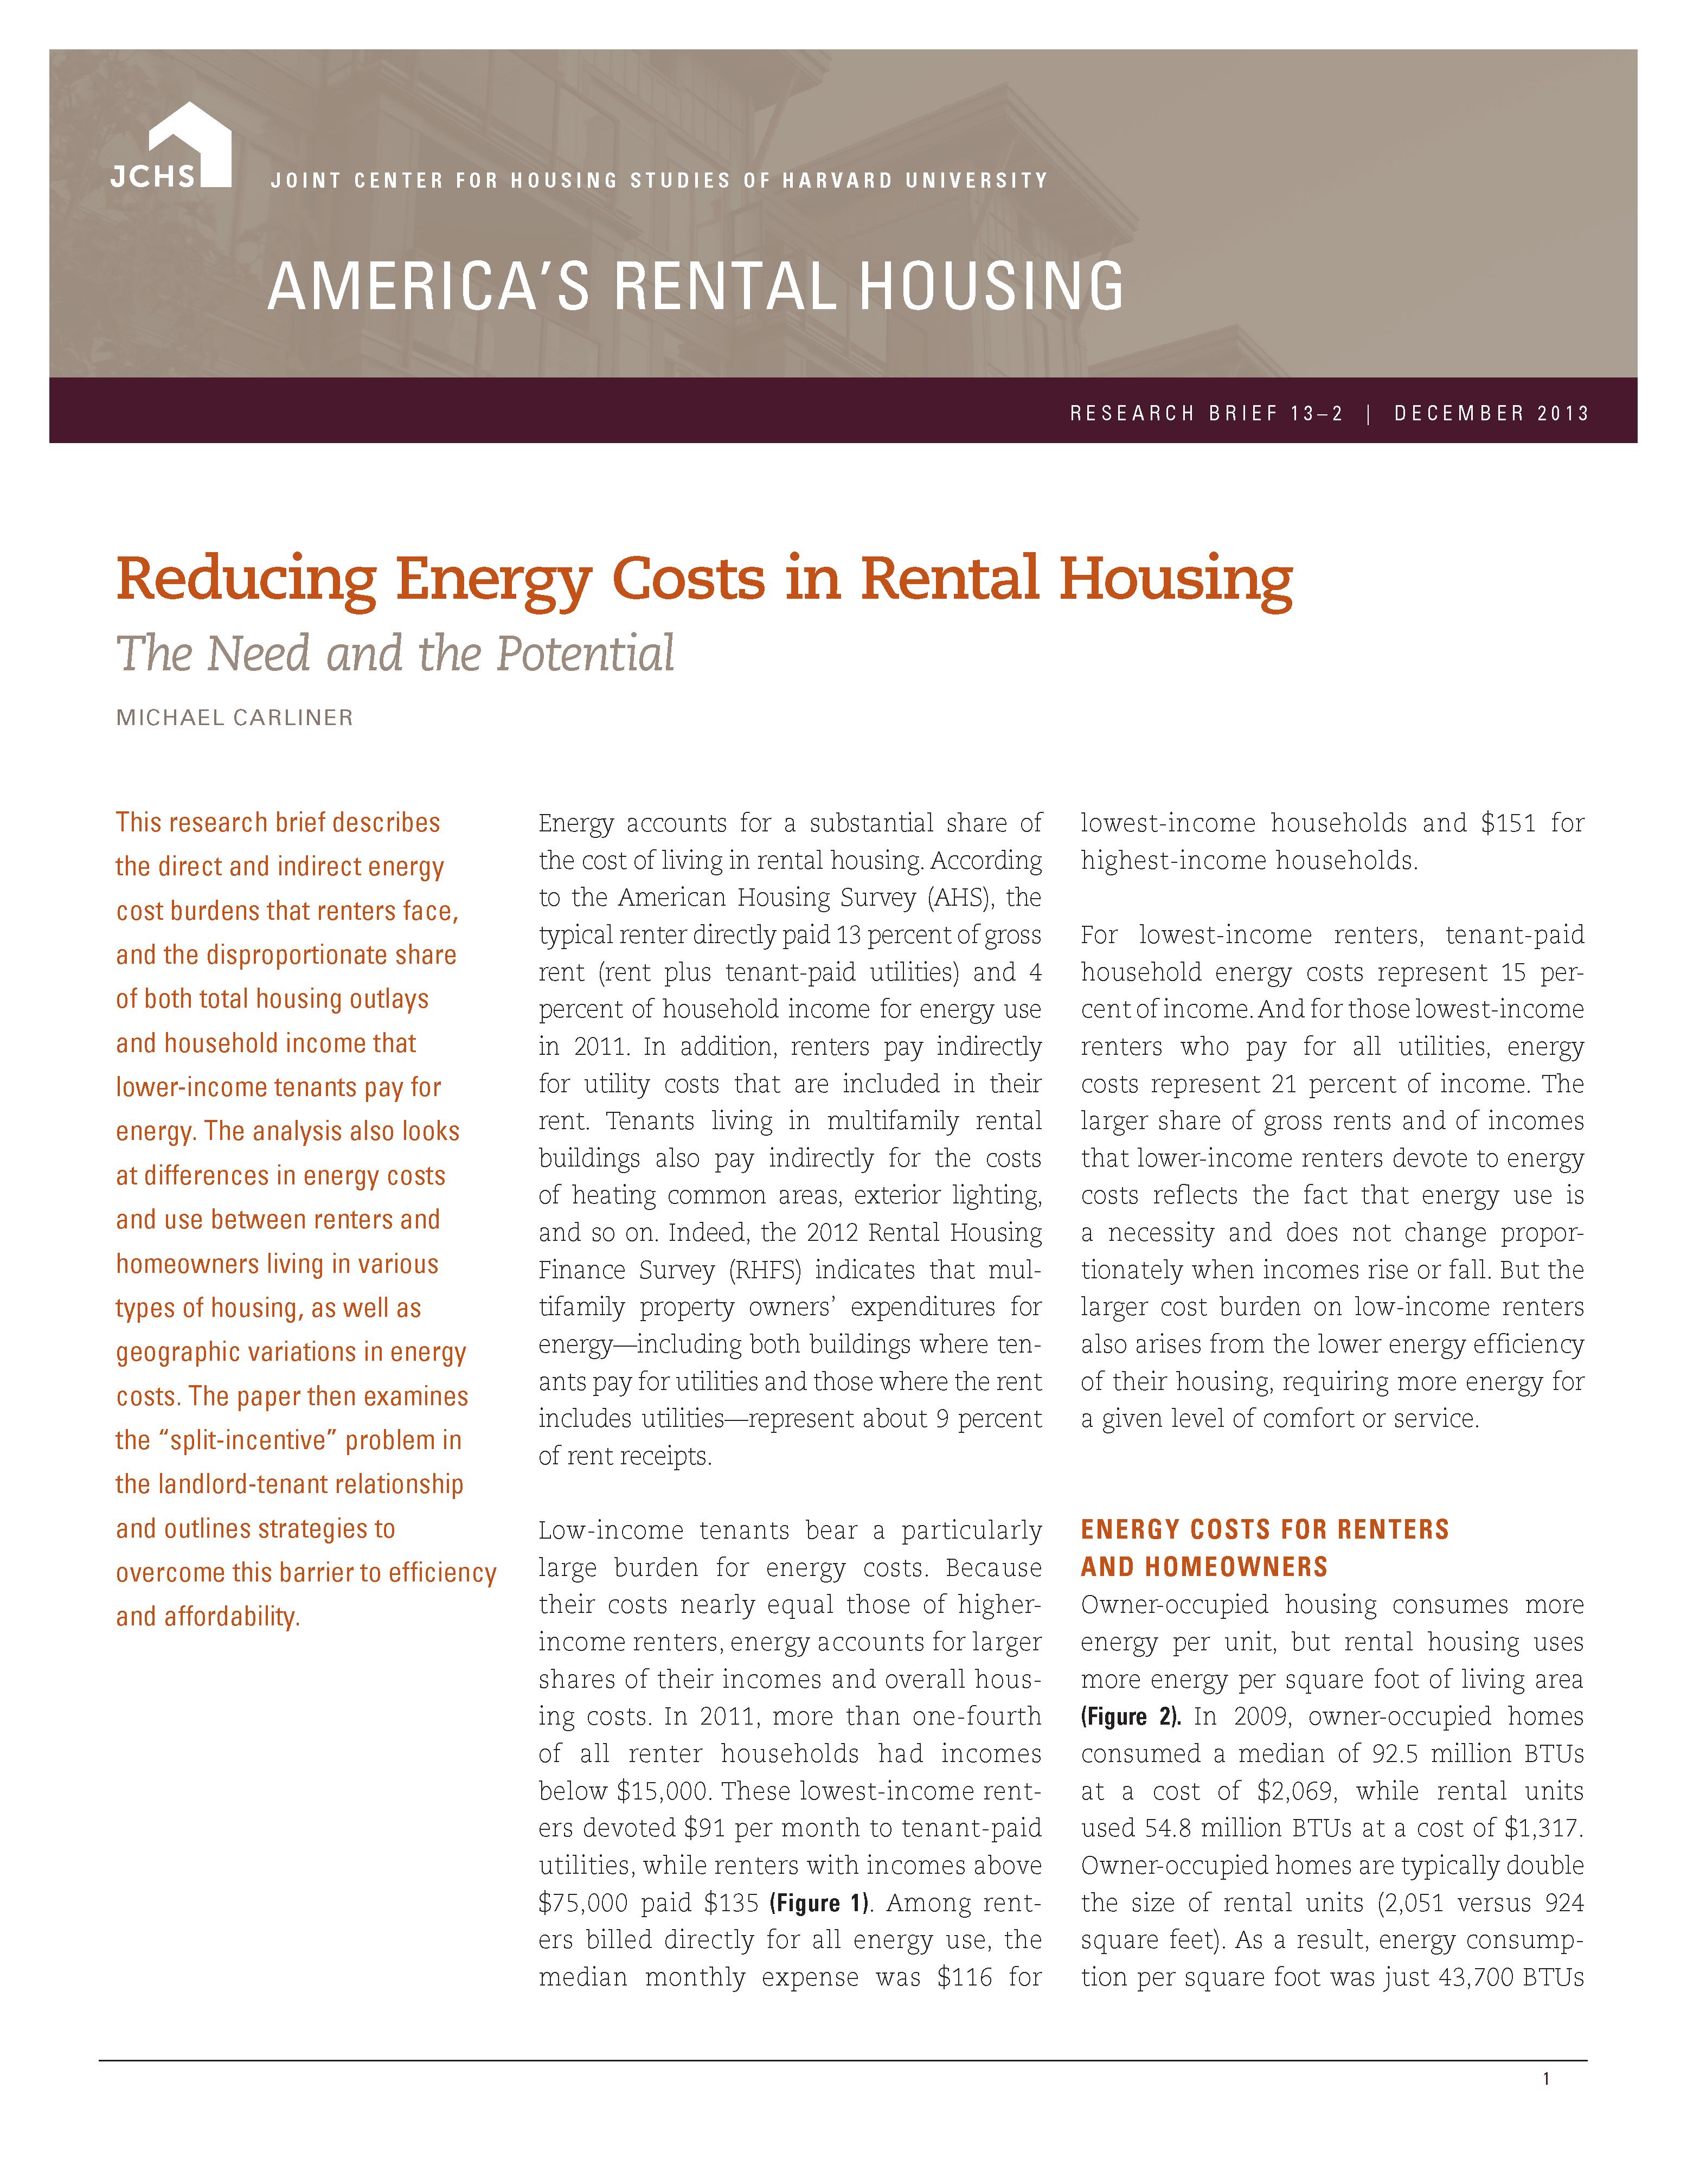 Reducing Energy Costs in Rental Housing